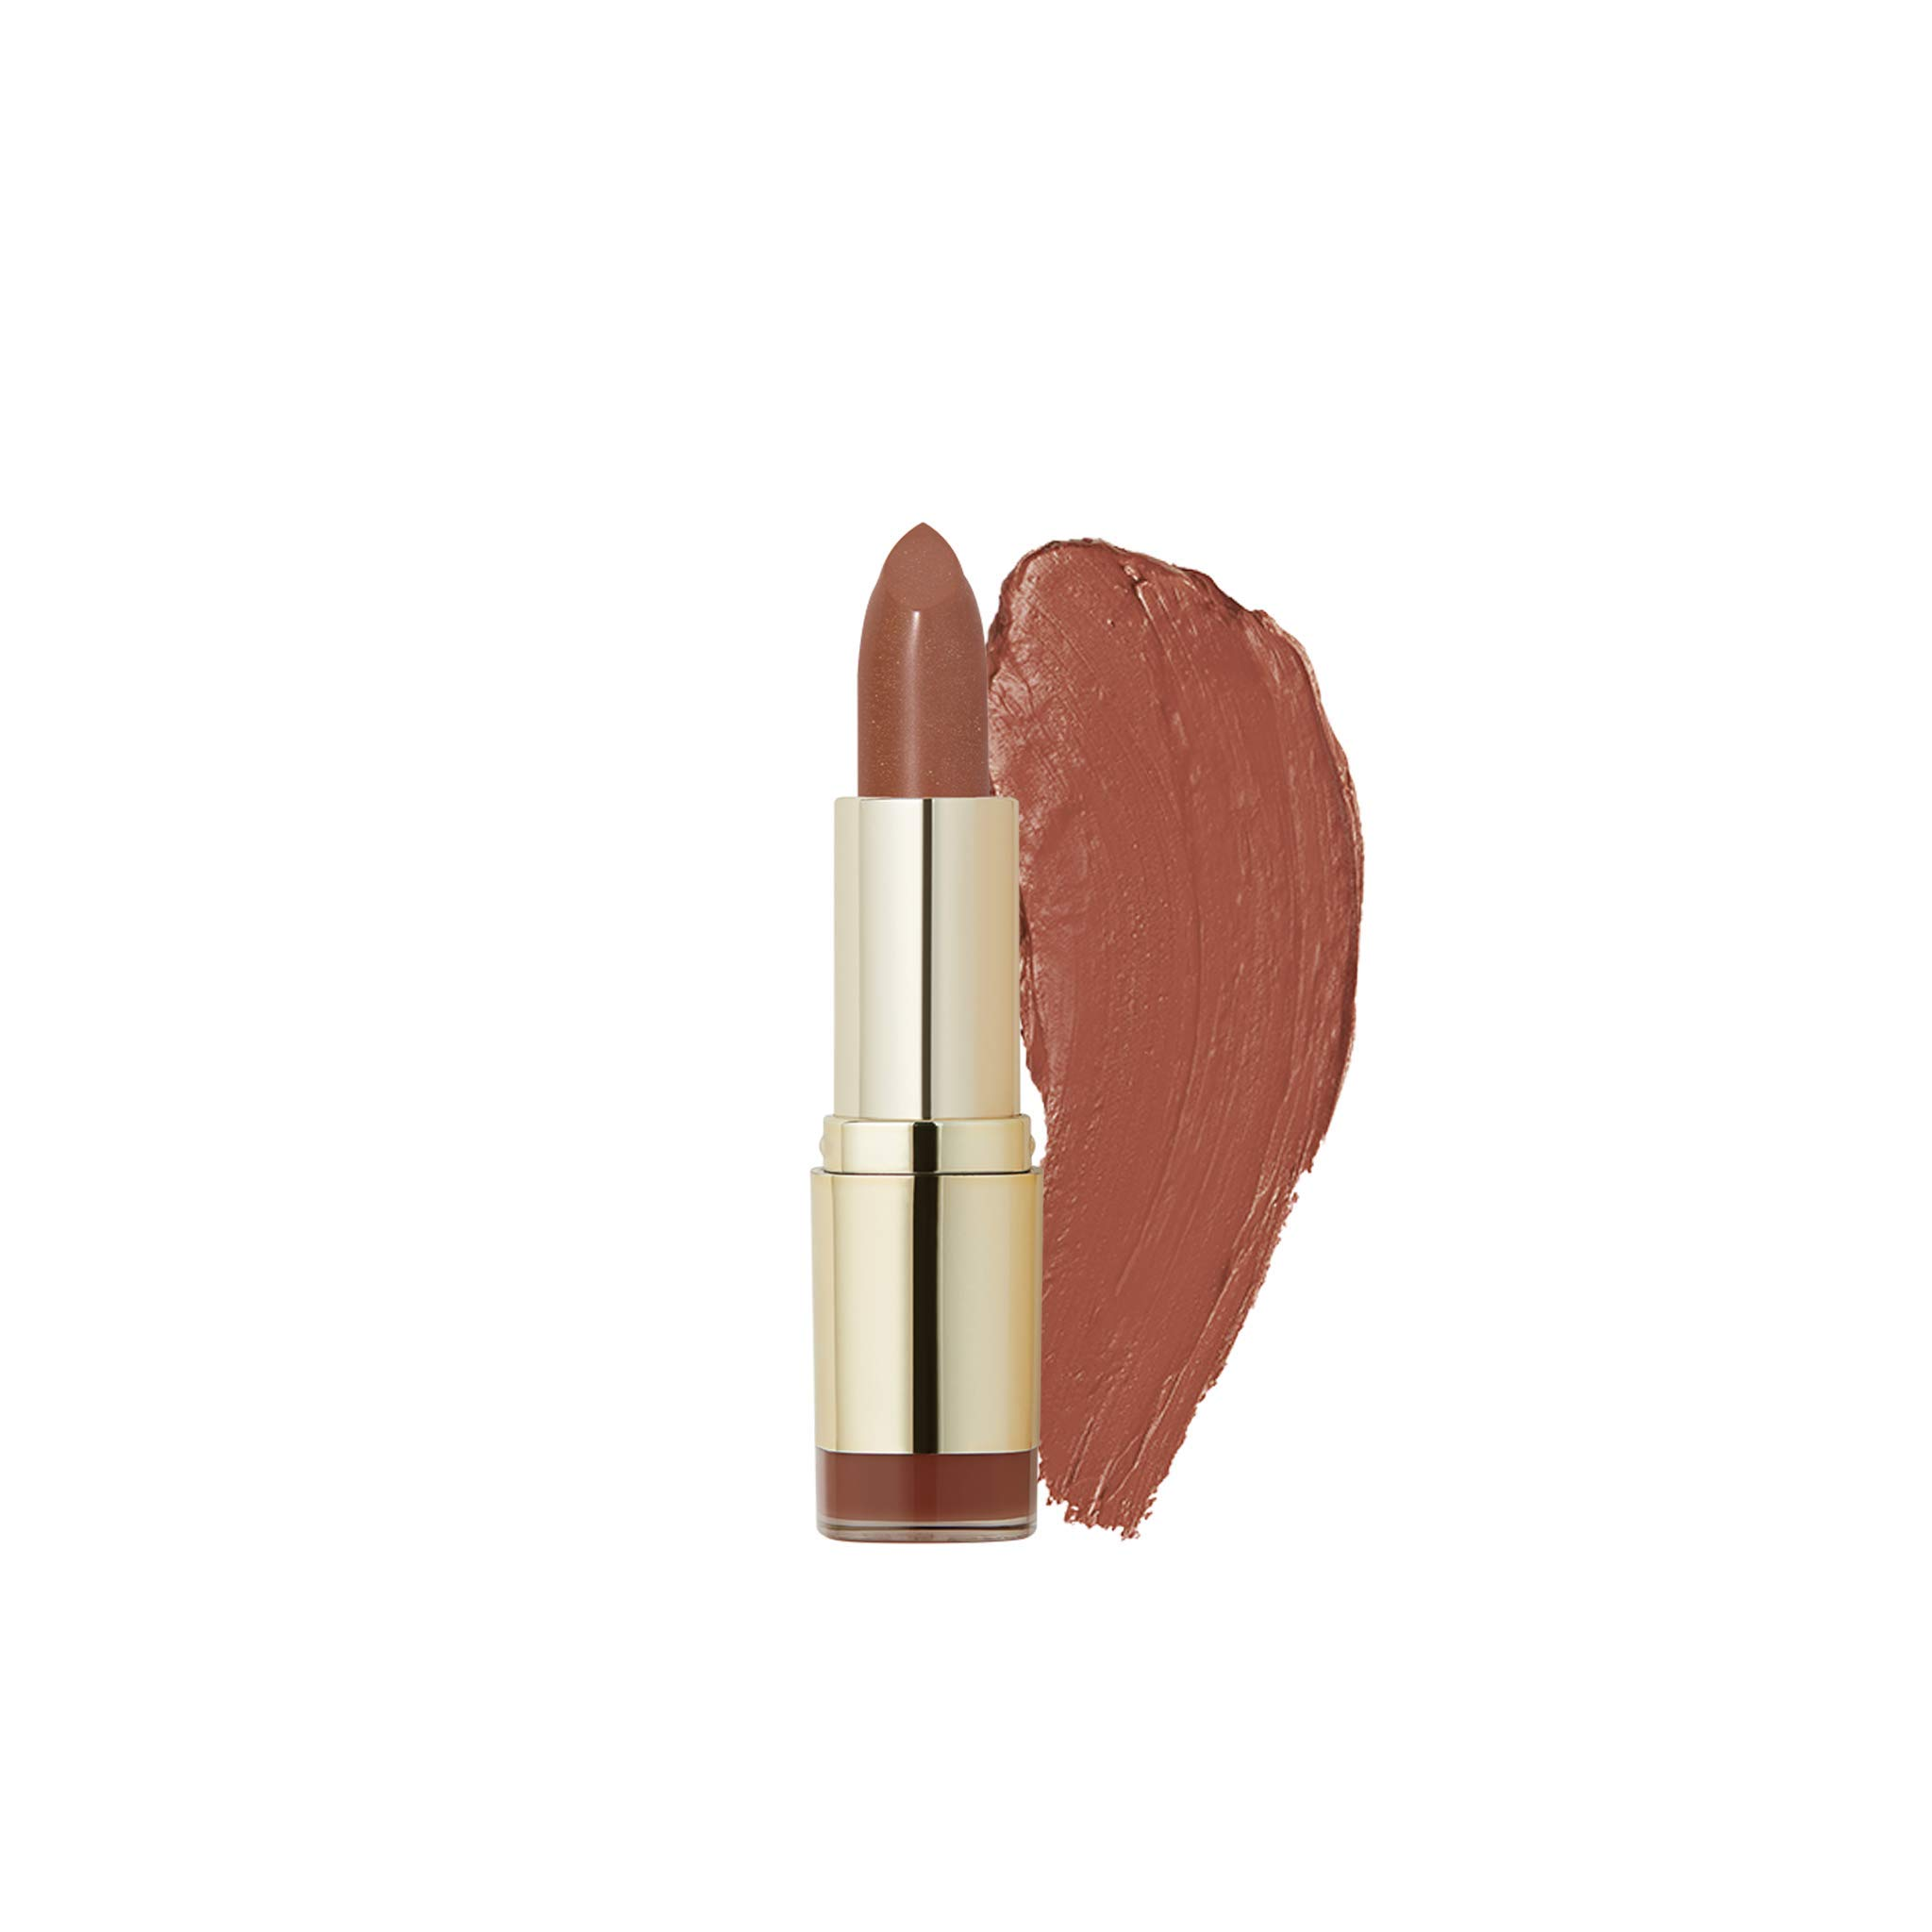 Milani Color Statement Lipstick - Bronze Beauty, Cruelty-Free Nourishing Lip Stick in Vibrant Shades, Red Lipstick, 0.14 Ounce